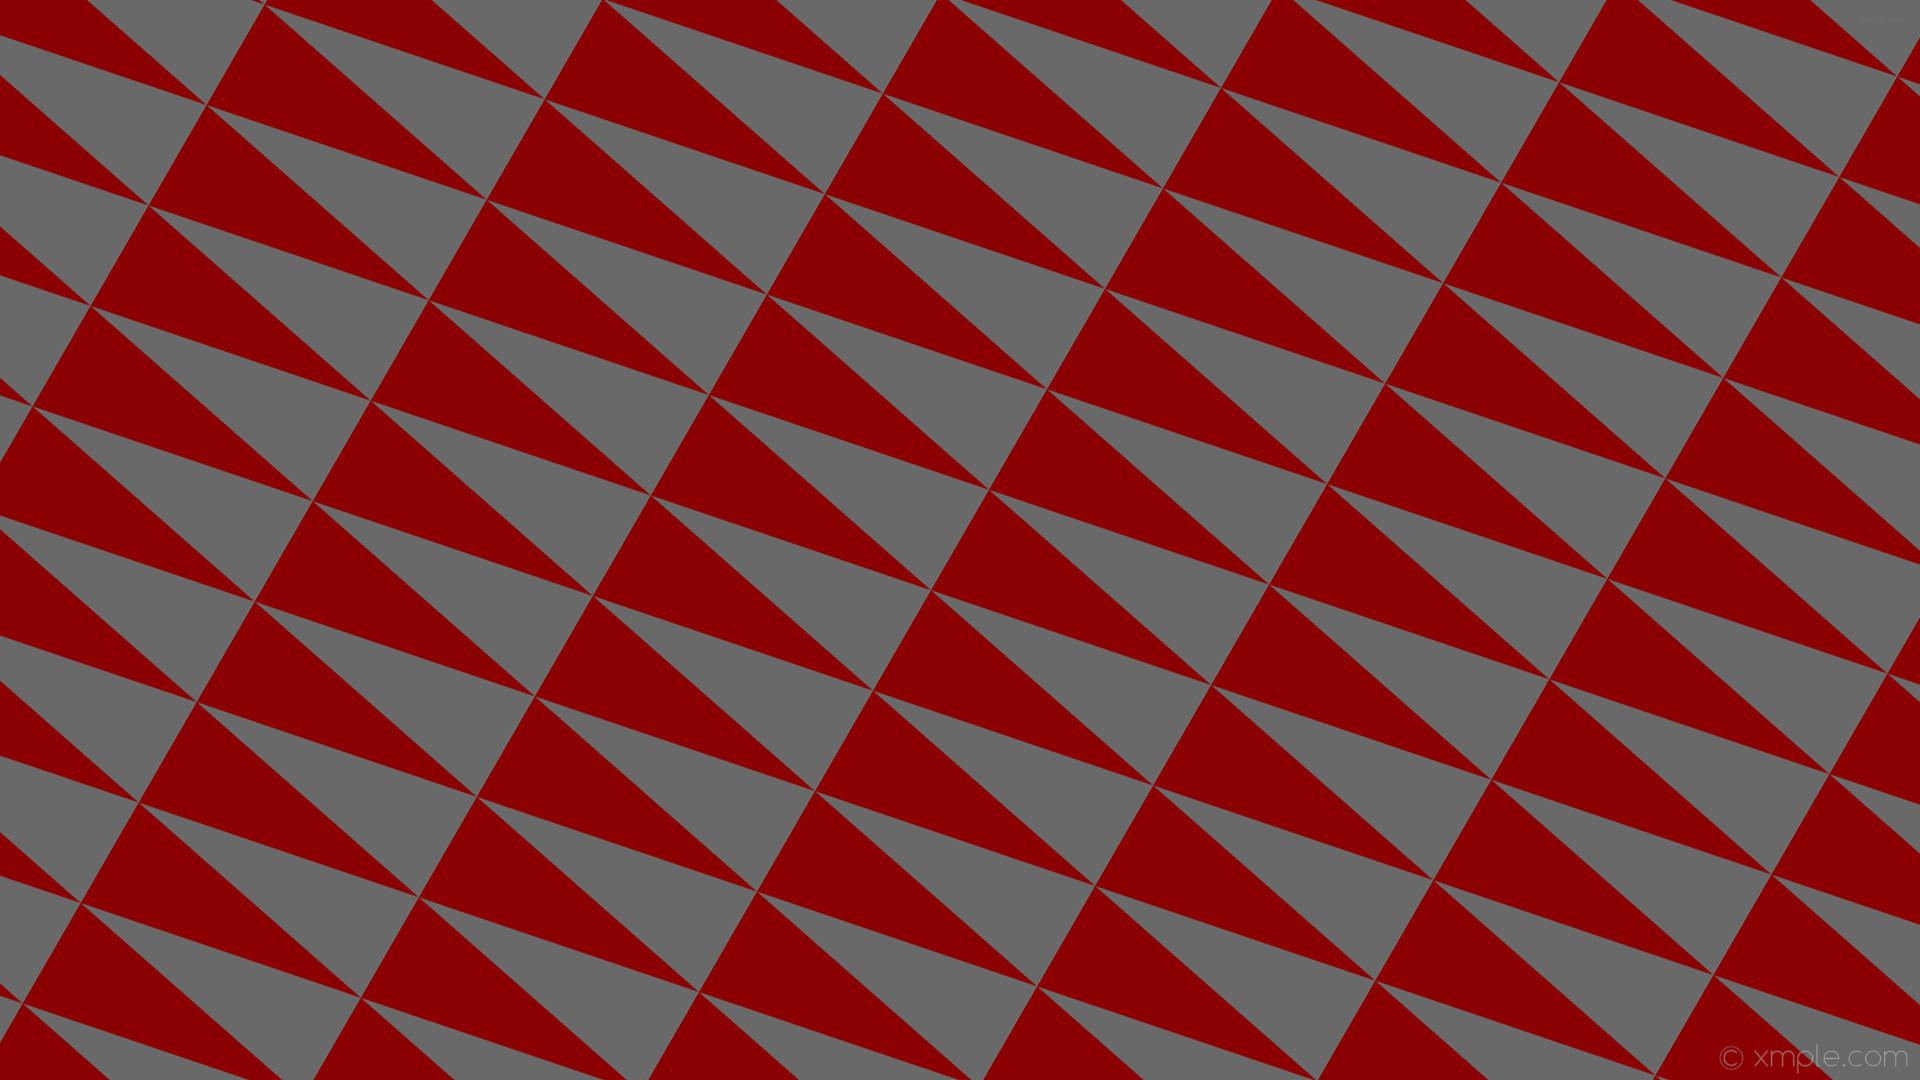 wallpaper red triangle grey dark red dim gray #8b0000 #696969 60° 116px  580px